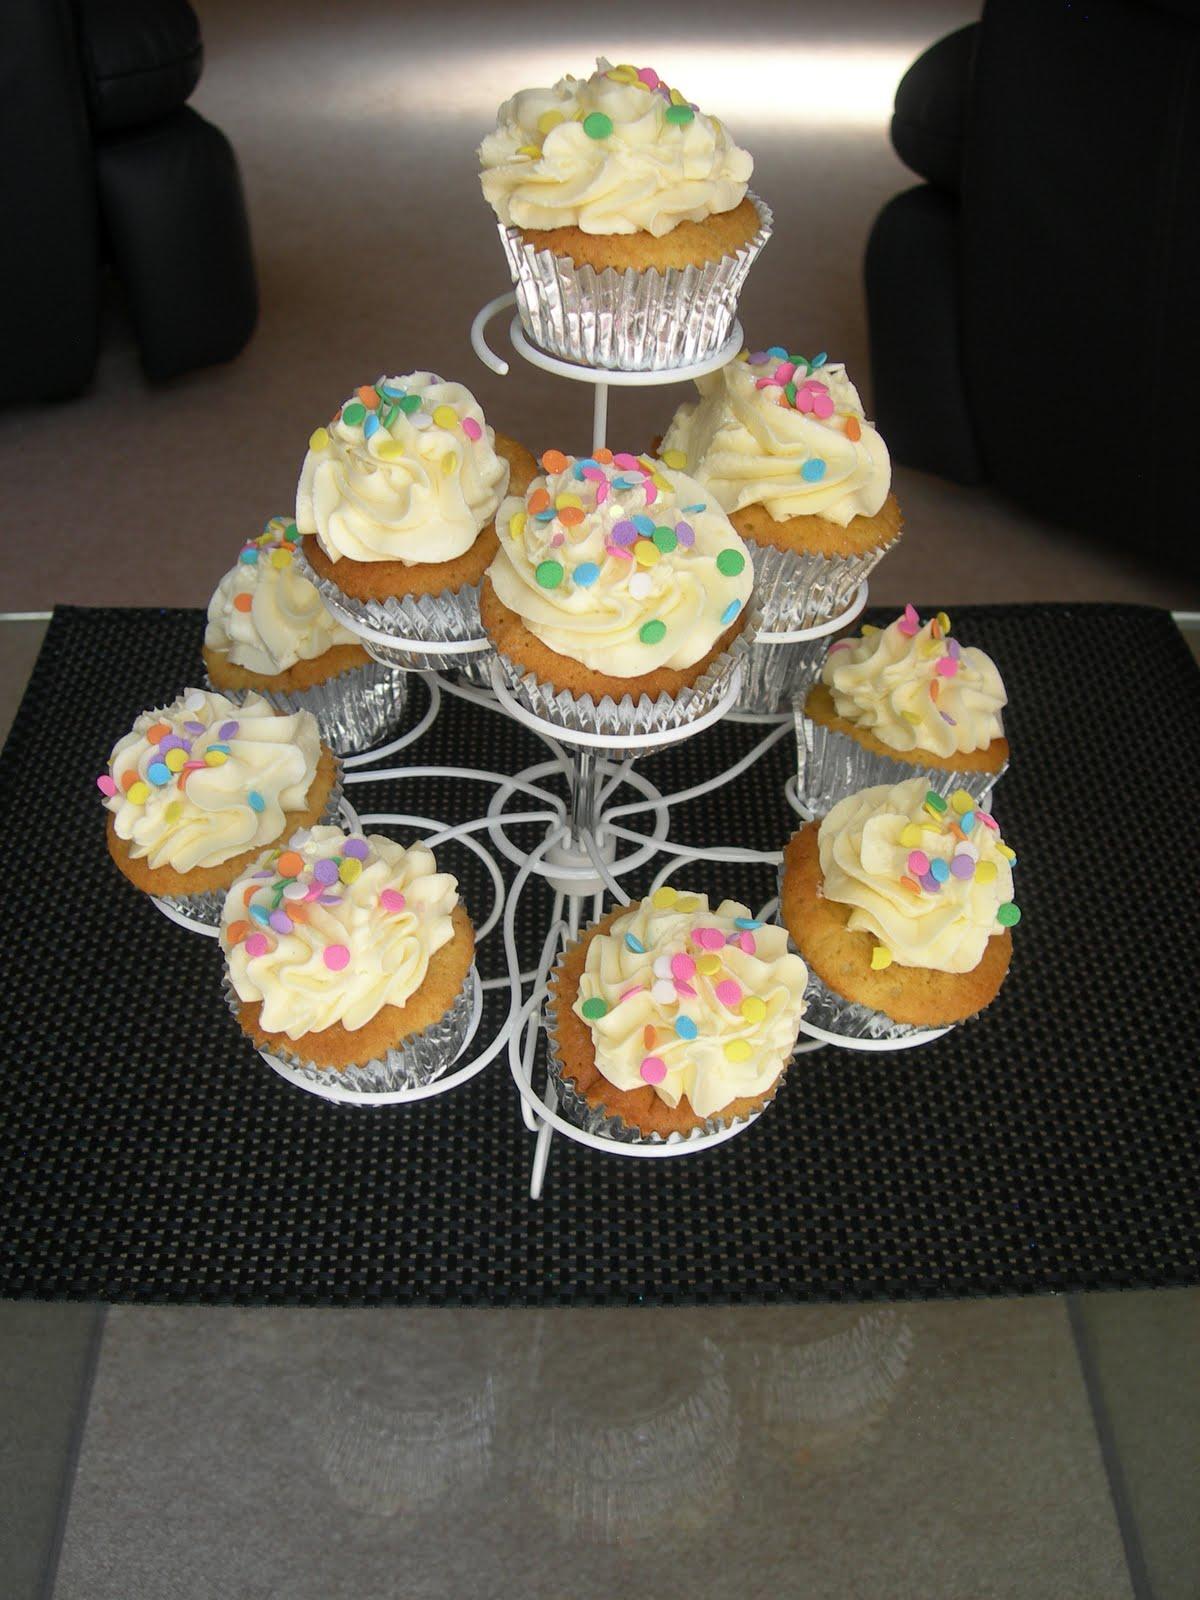 Custom Cake Designs Uk : Custom Cake Design: Camilla s cupcakes